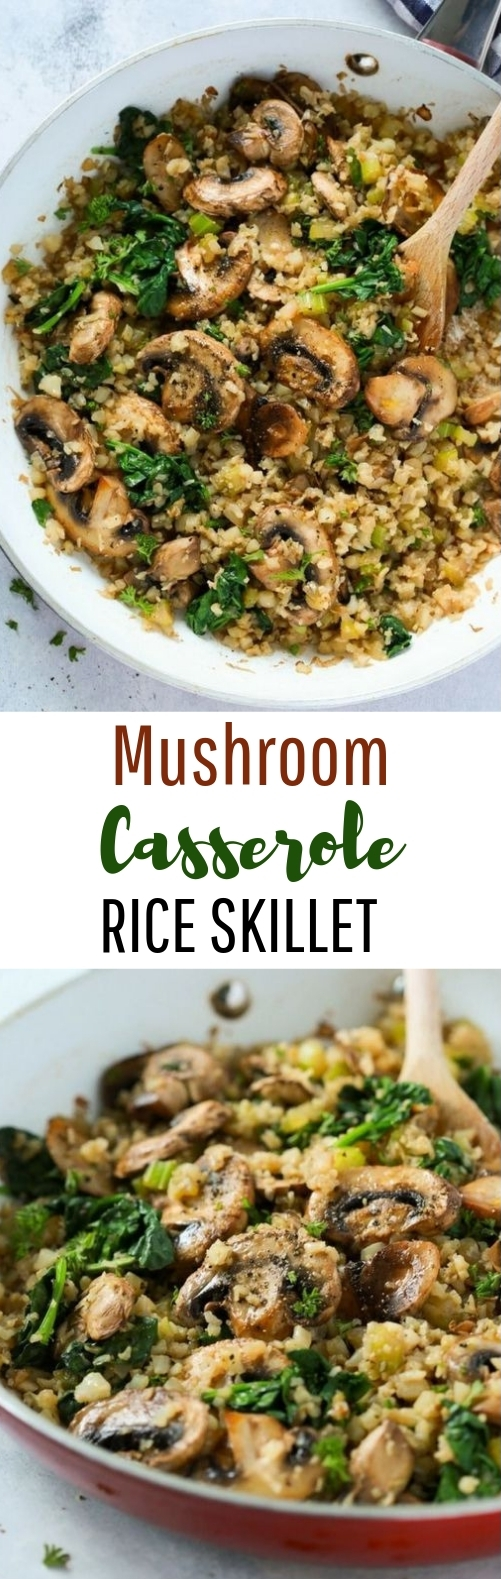 Mushroom Cauliflower Rice Skillet #healthy #vegetarian